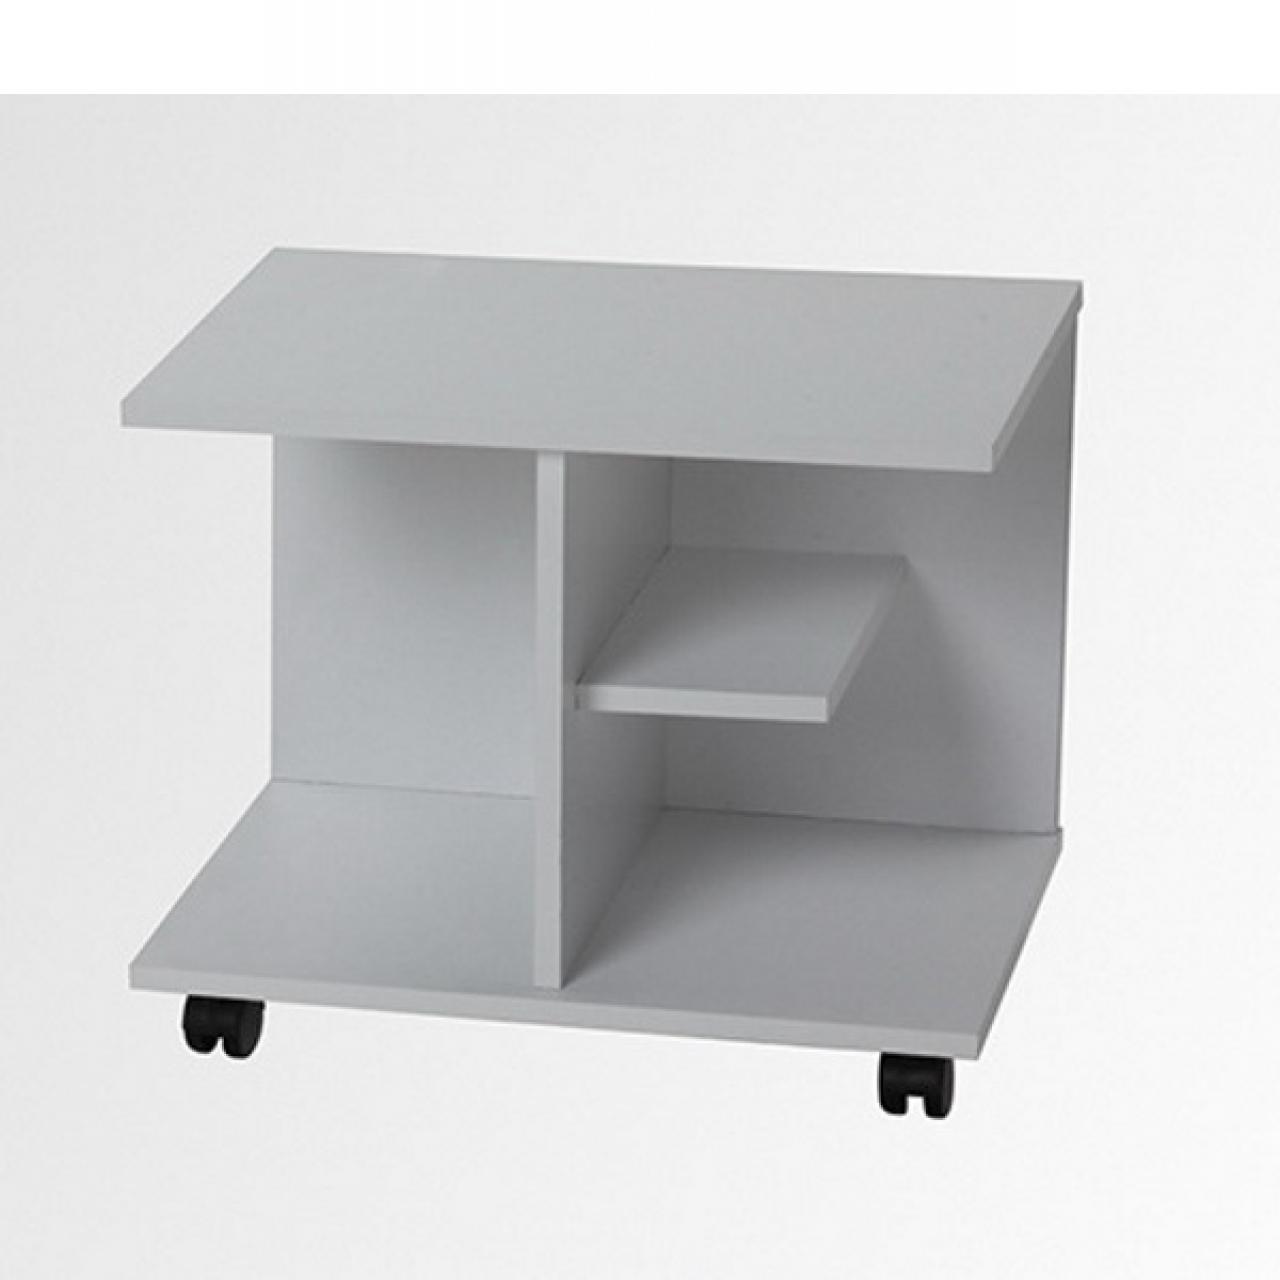 coffee 2073303701 m bel j hnichen center gmbh. Black Bedroom Furniture Sets. Home Design Ideas